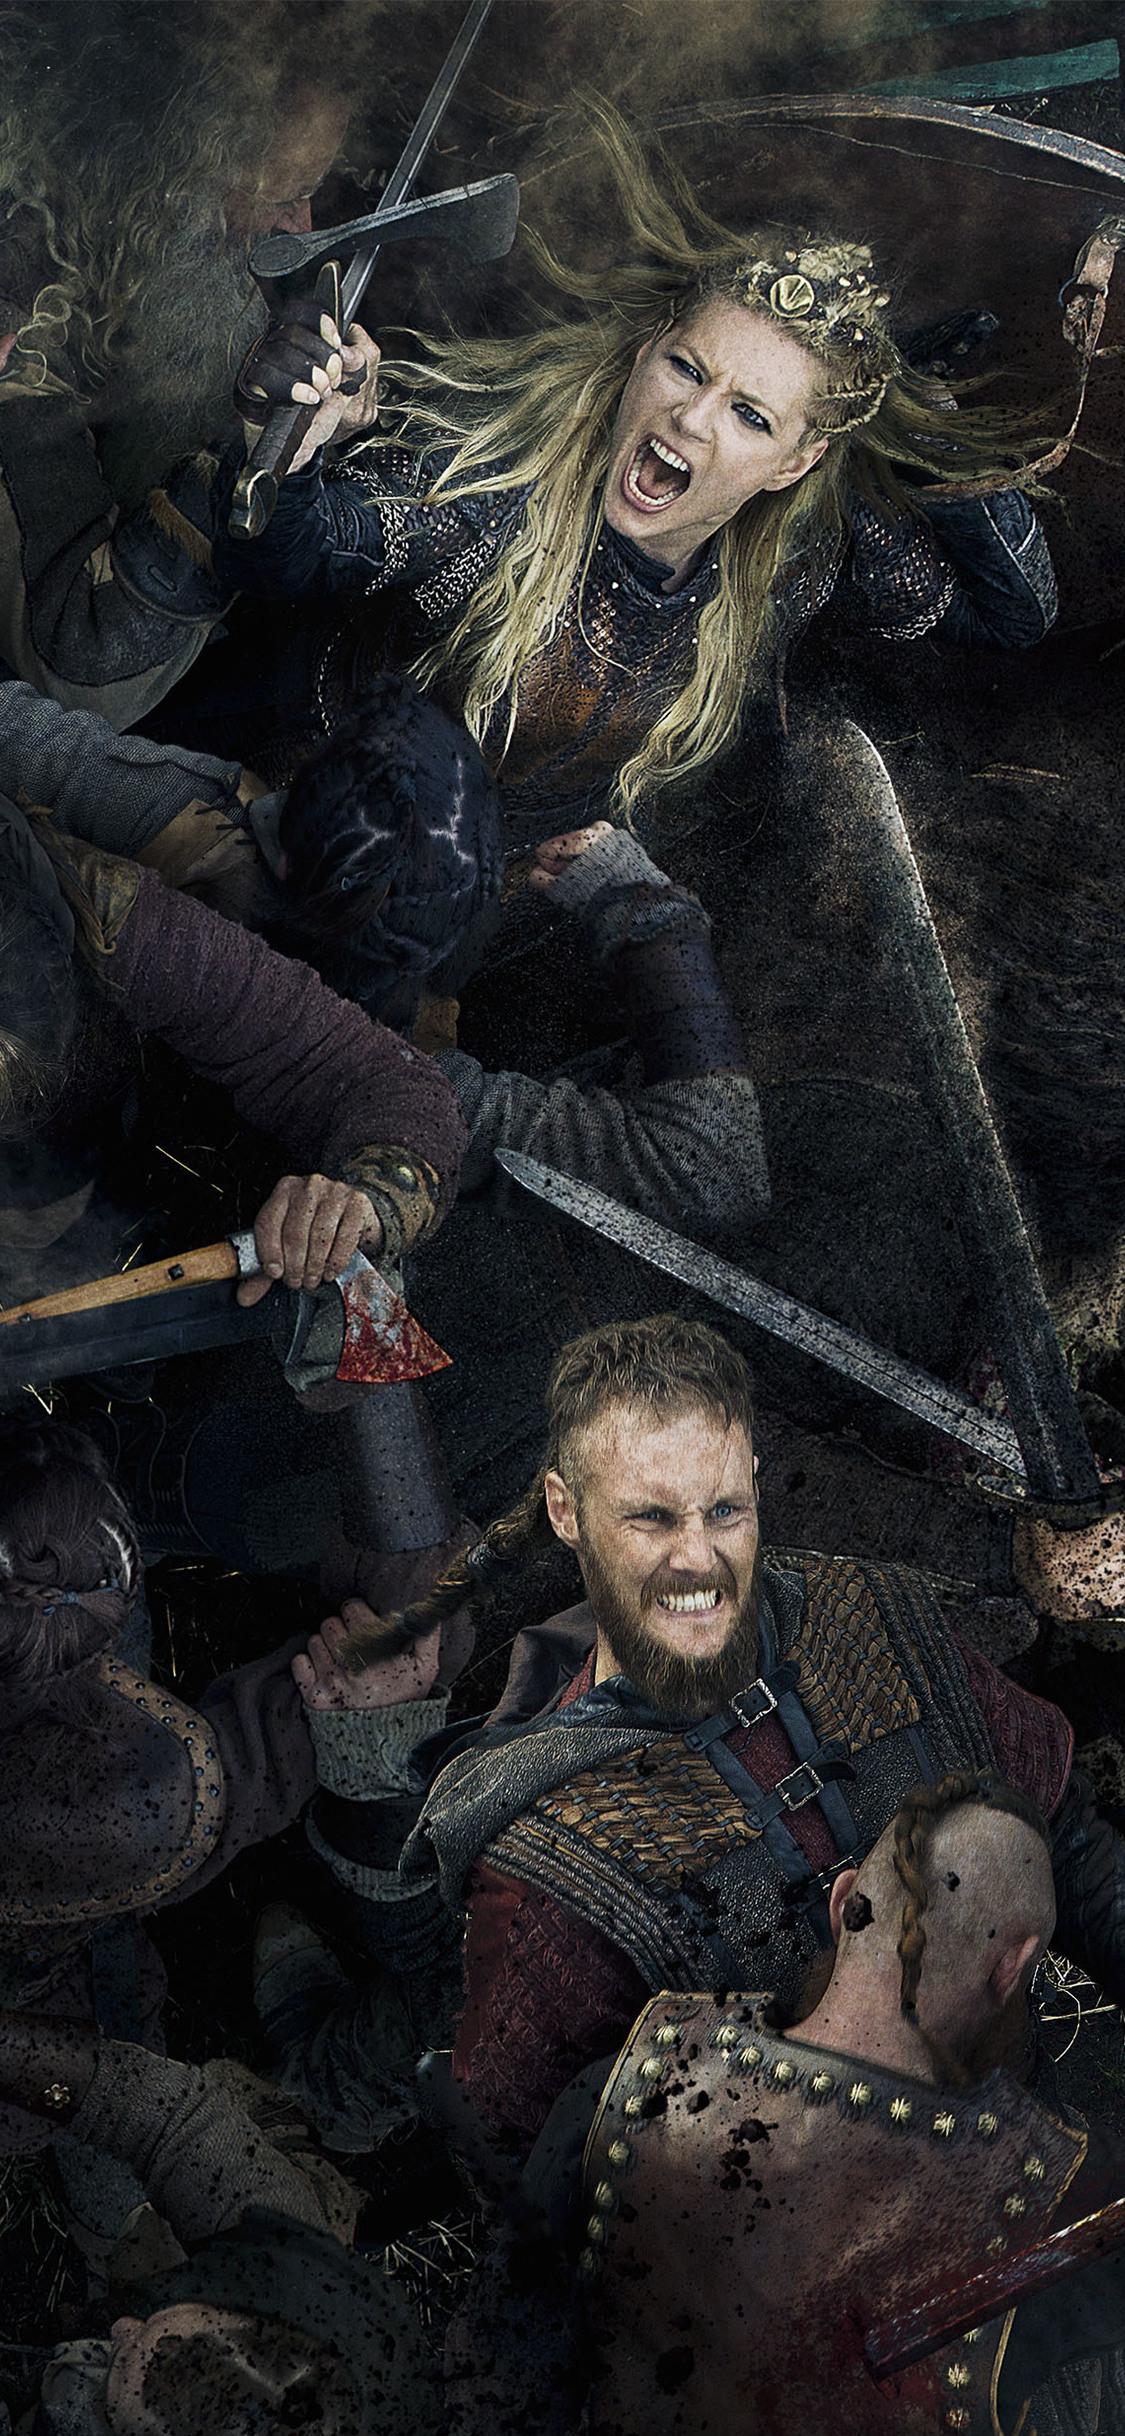 Wallpaper de Vikingos